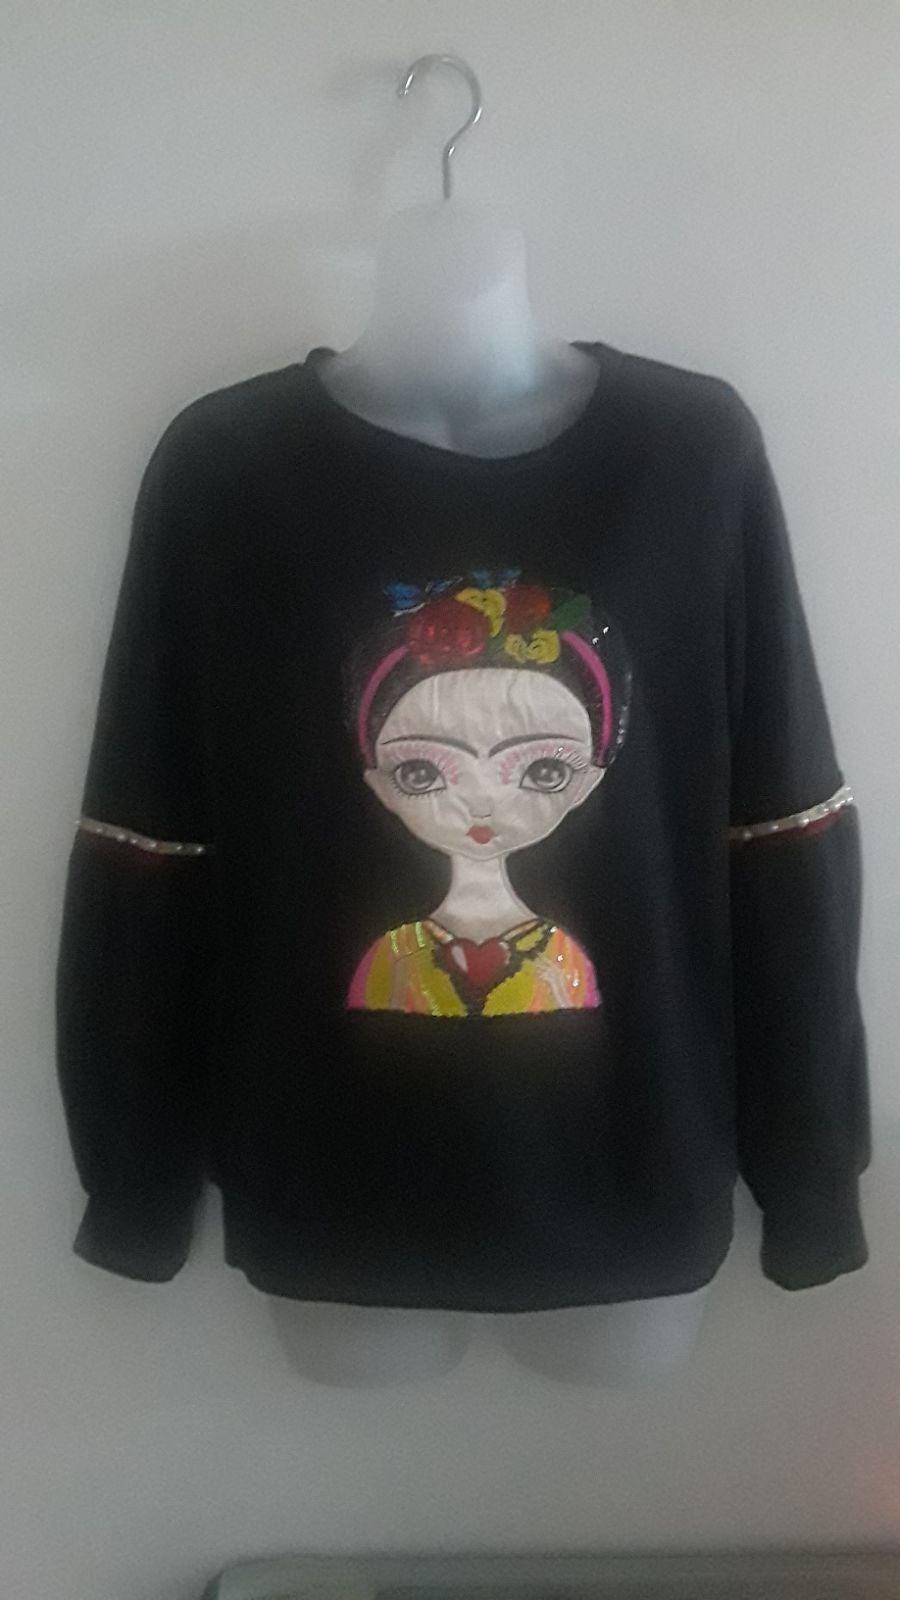 grey Frida kahlo Embroidery sweatshirt